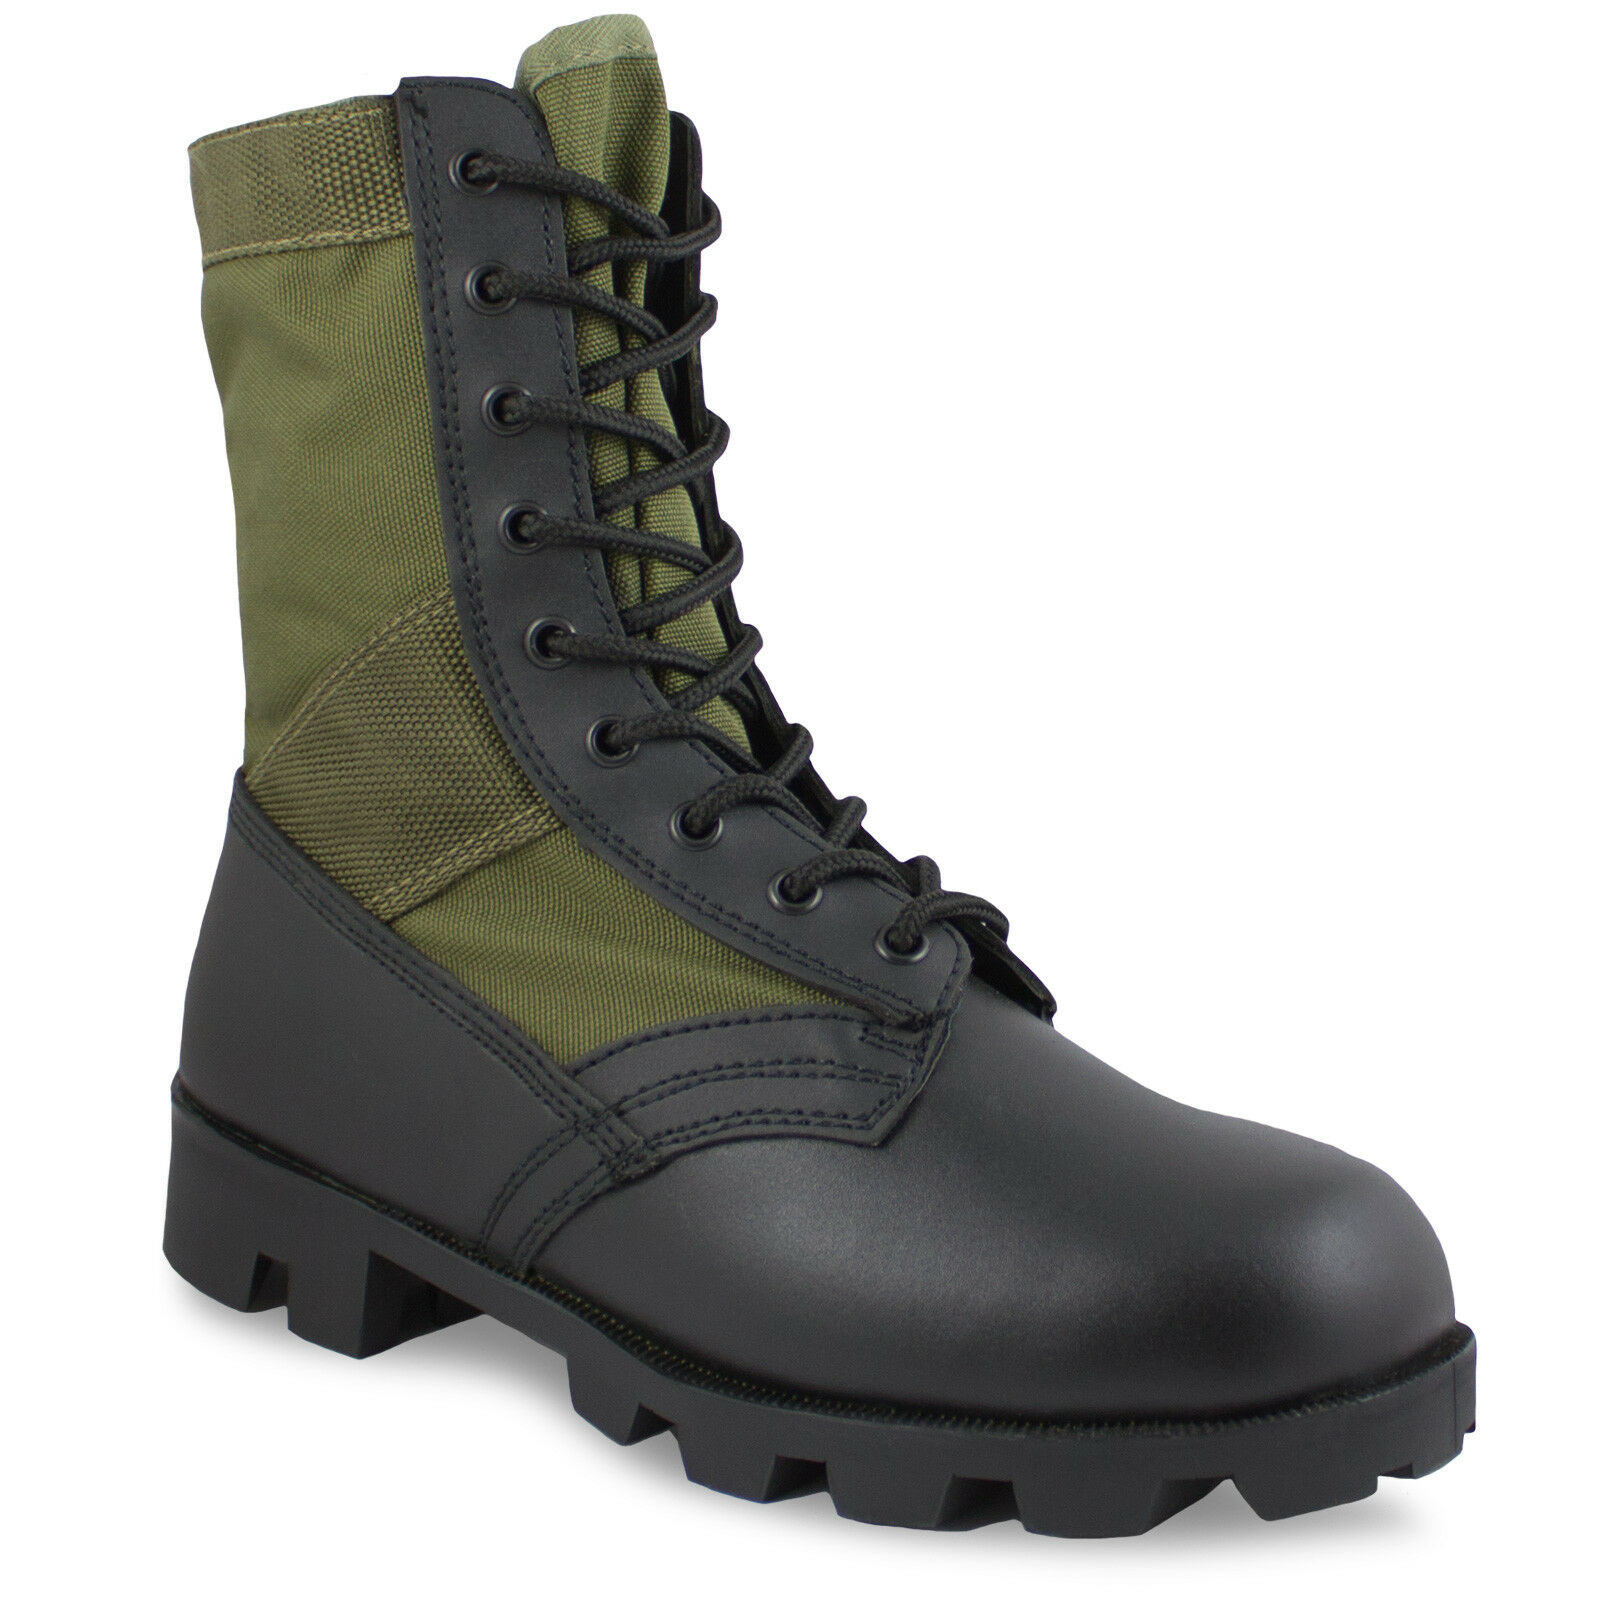 US Army Panama Leggero Stivali Jungle Vietnam Militare ASSALTO Combat Stivali Leggero Verde 92d4fb